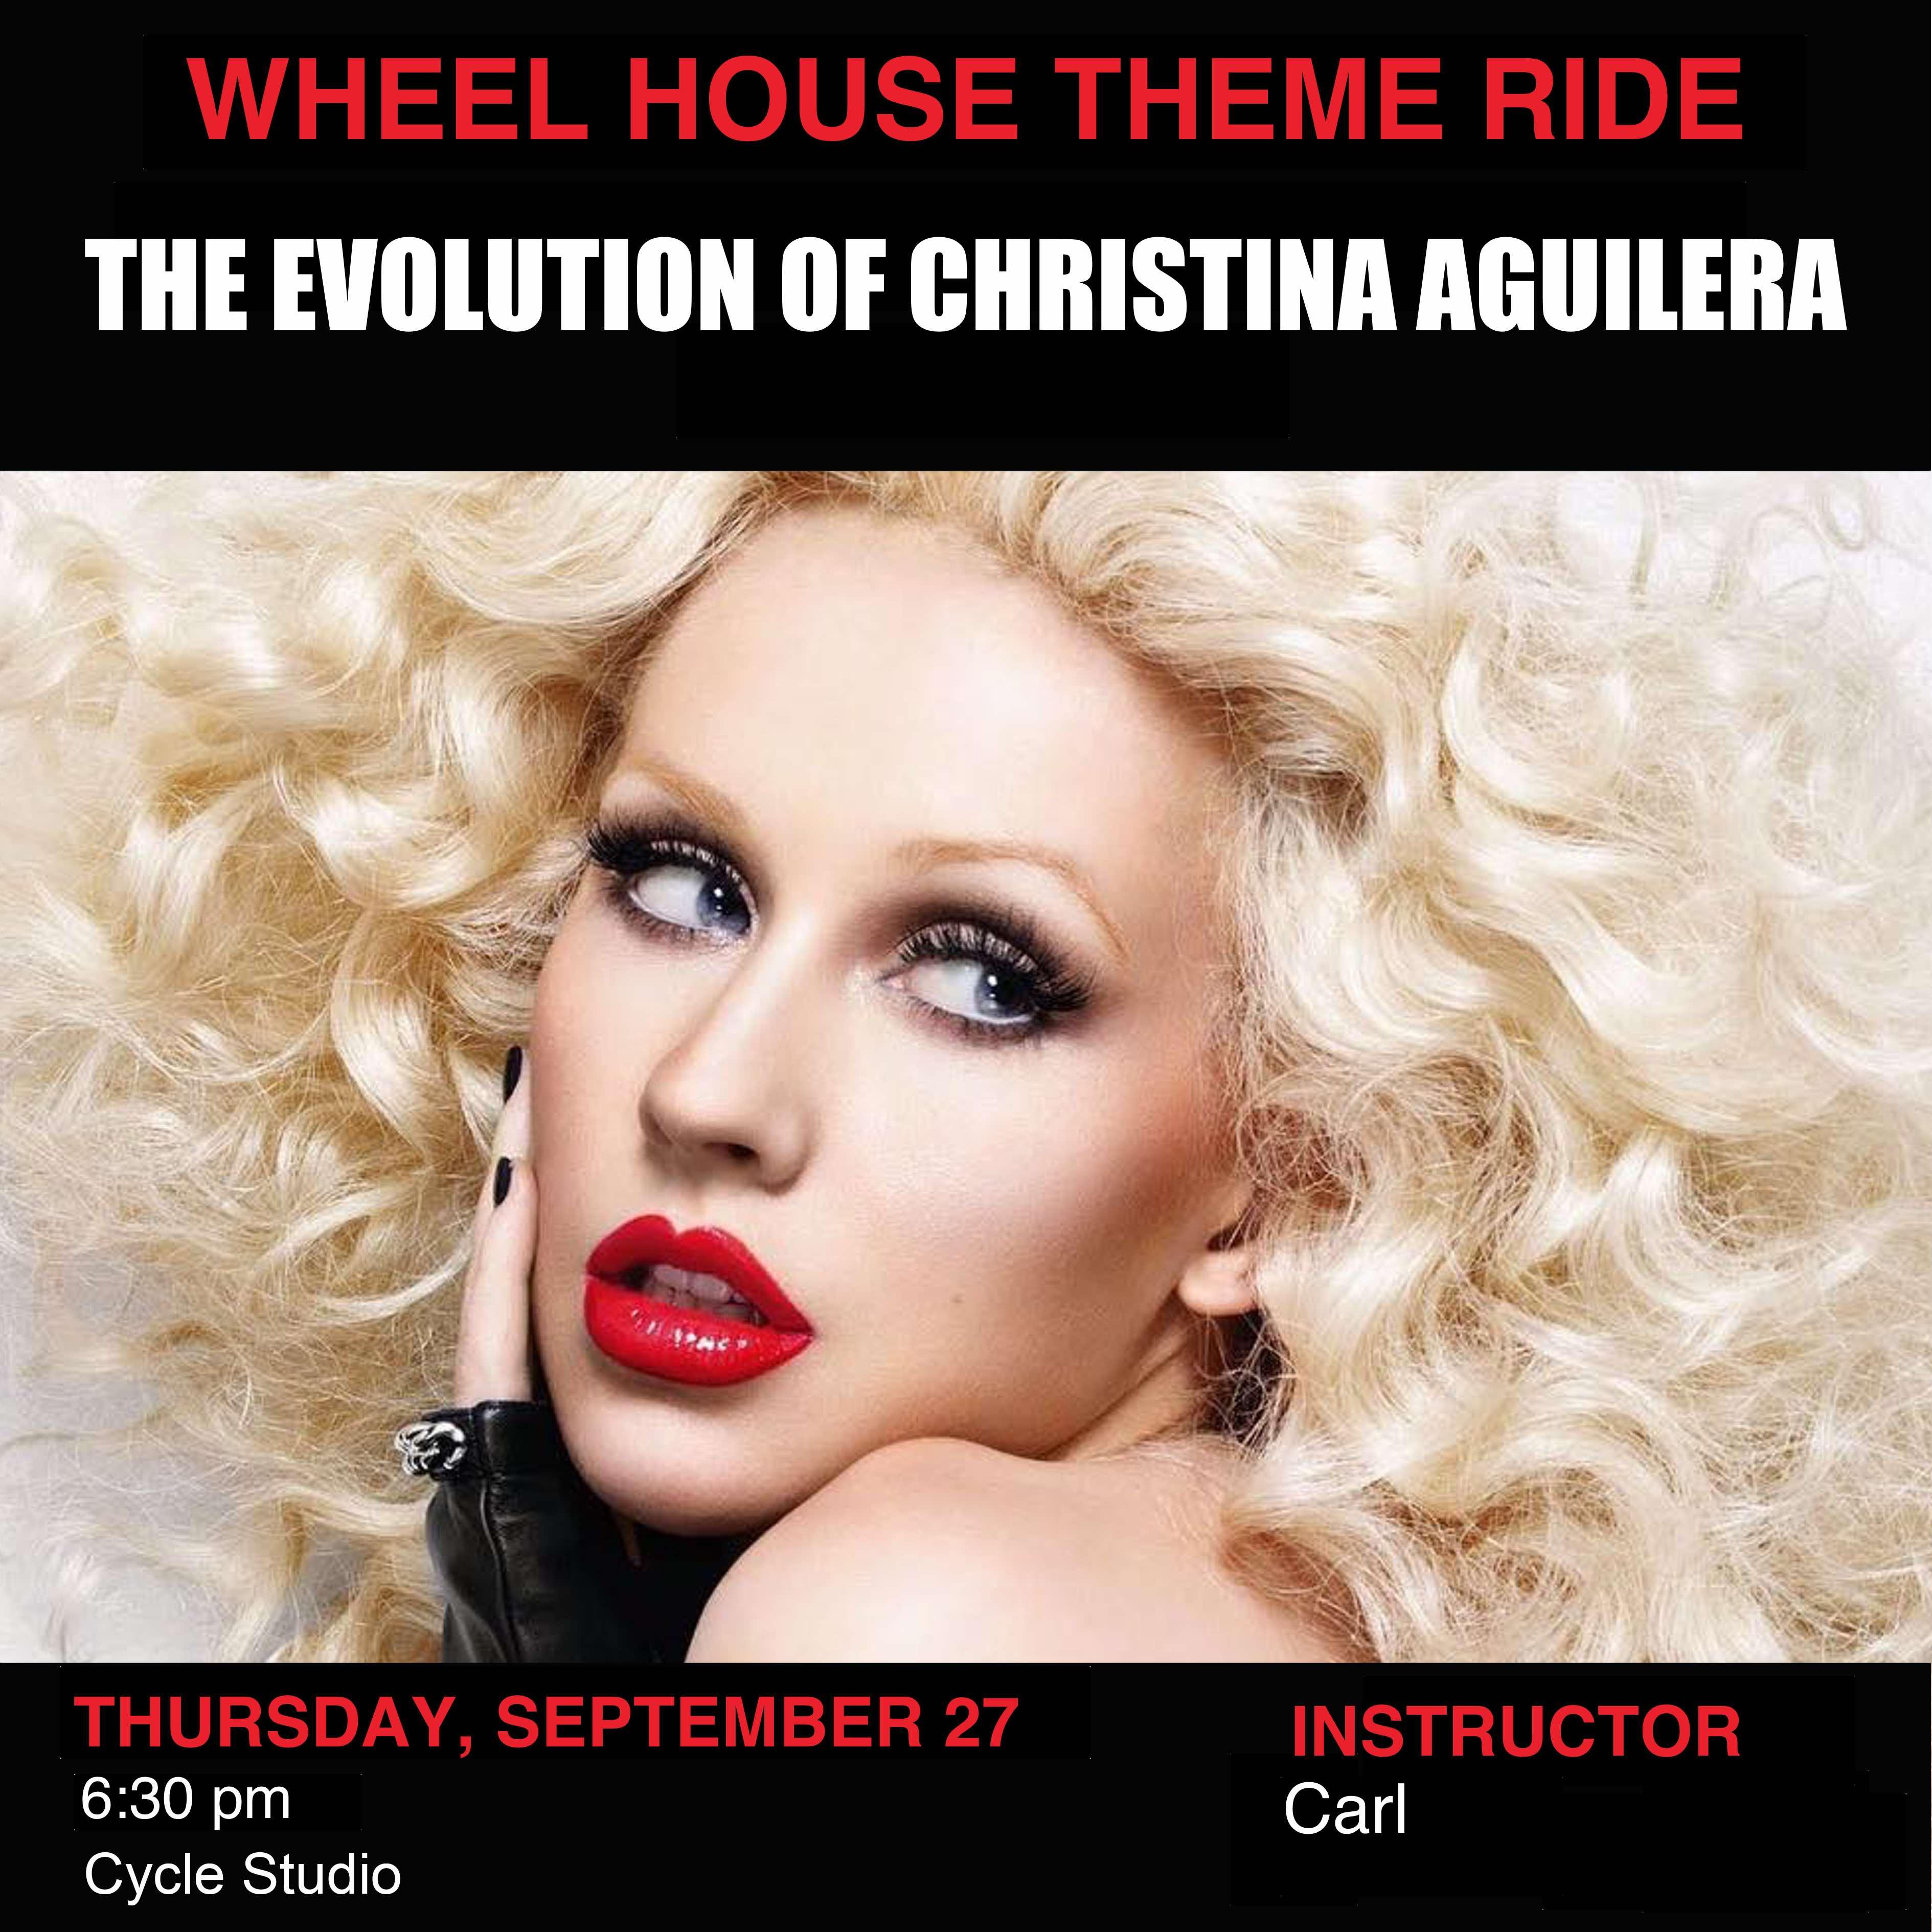 The Evolution of Christina Aguilera